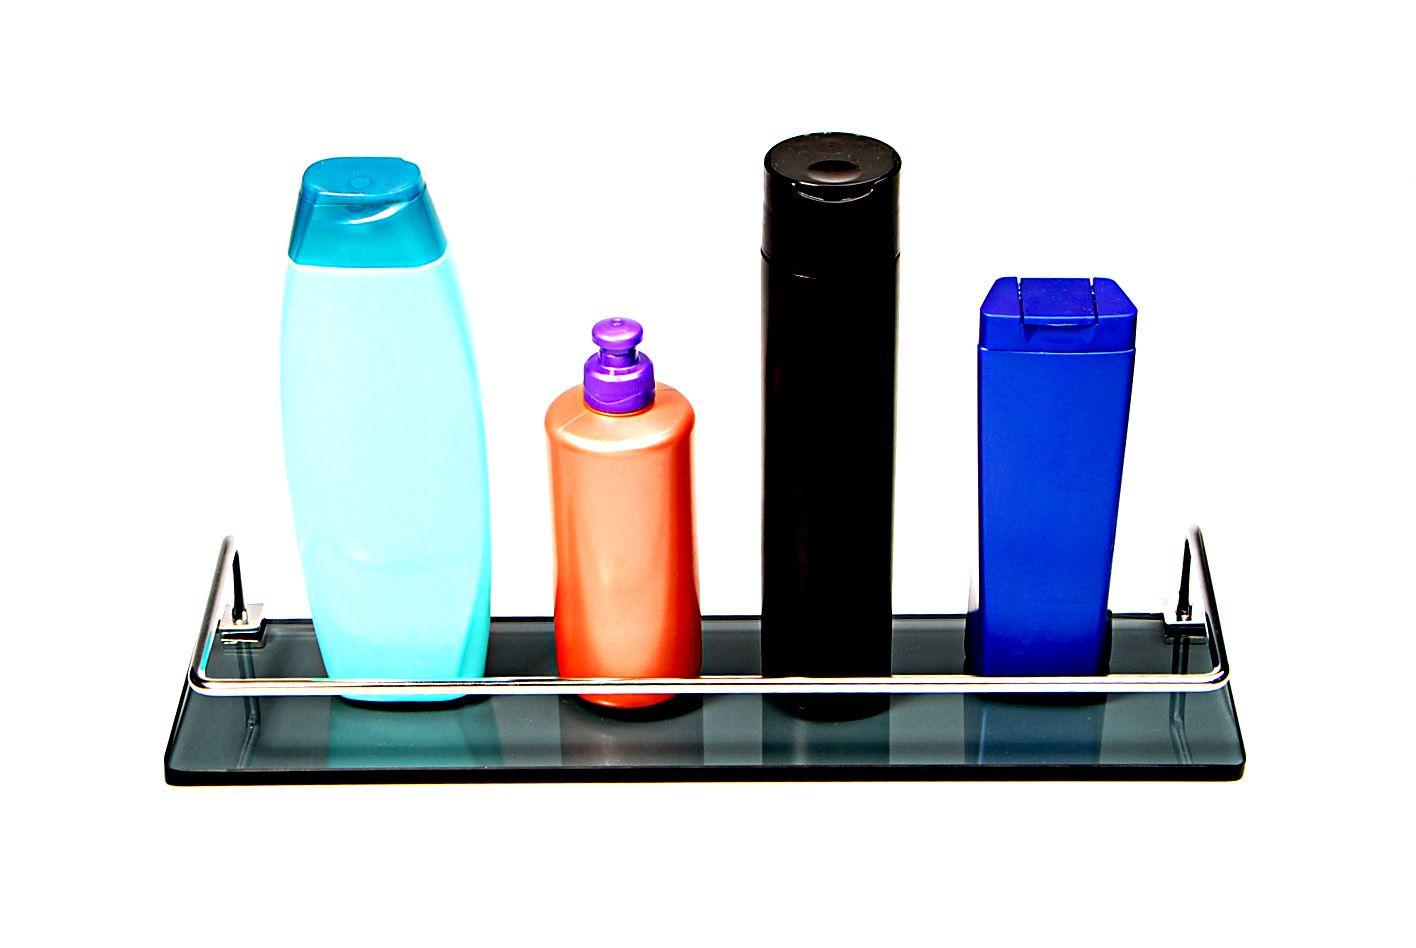 Porta Shampoo Reto em Vidro Fumê Lapidado - Aquabox  - 40cmx9cmx8mm